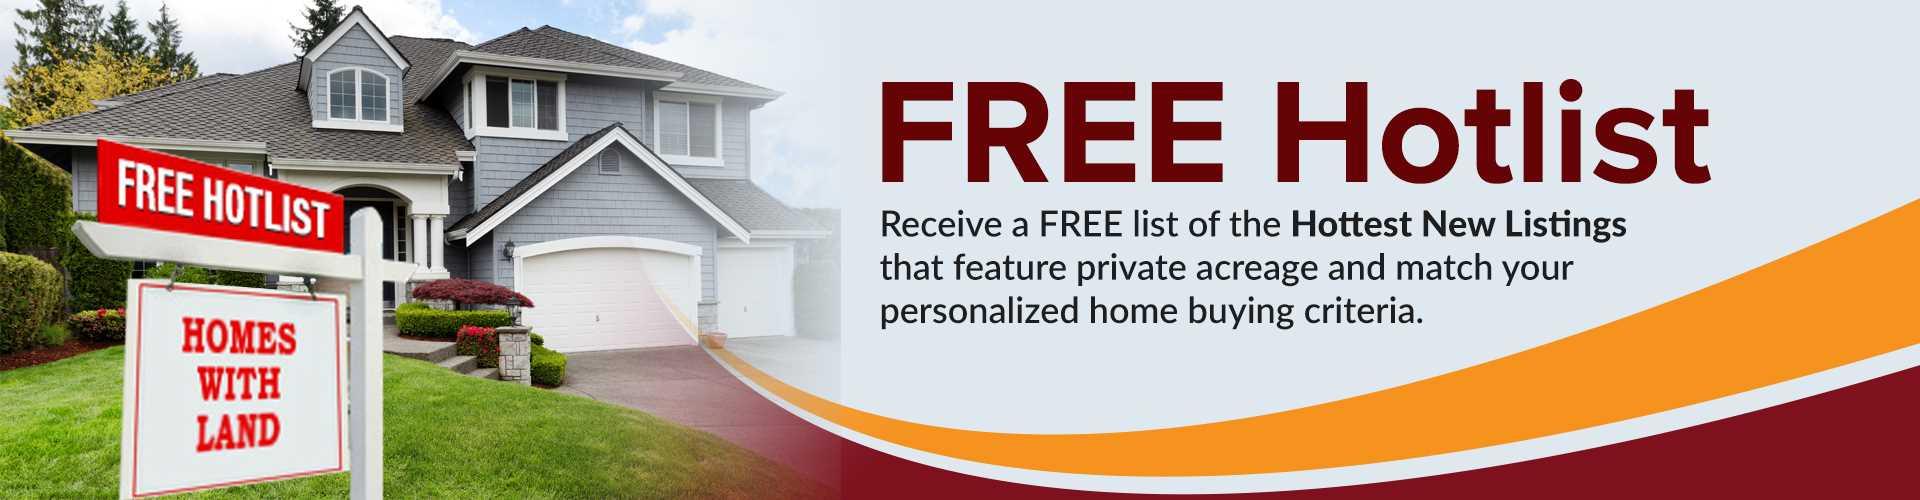 Hotlist of Properties on Acreage Image